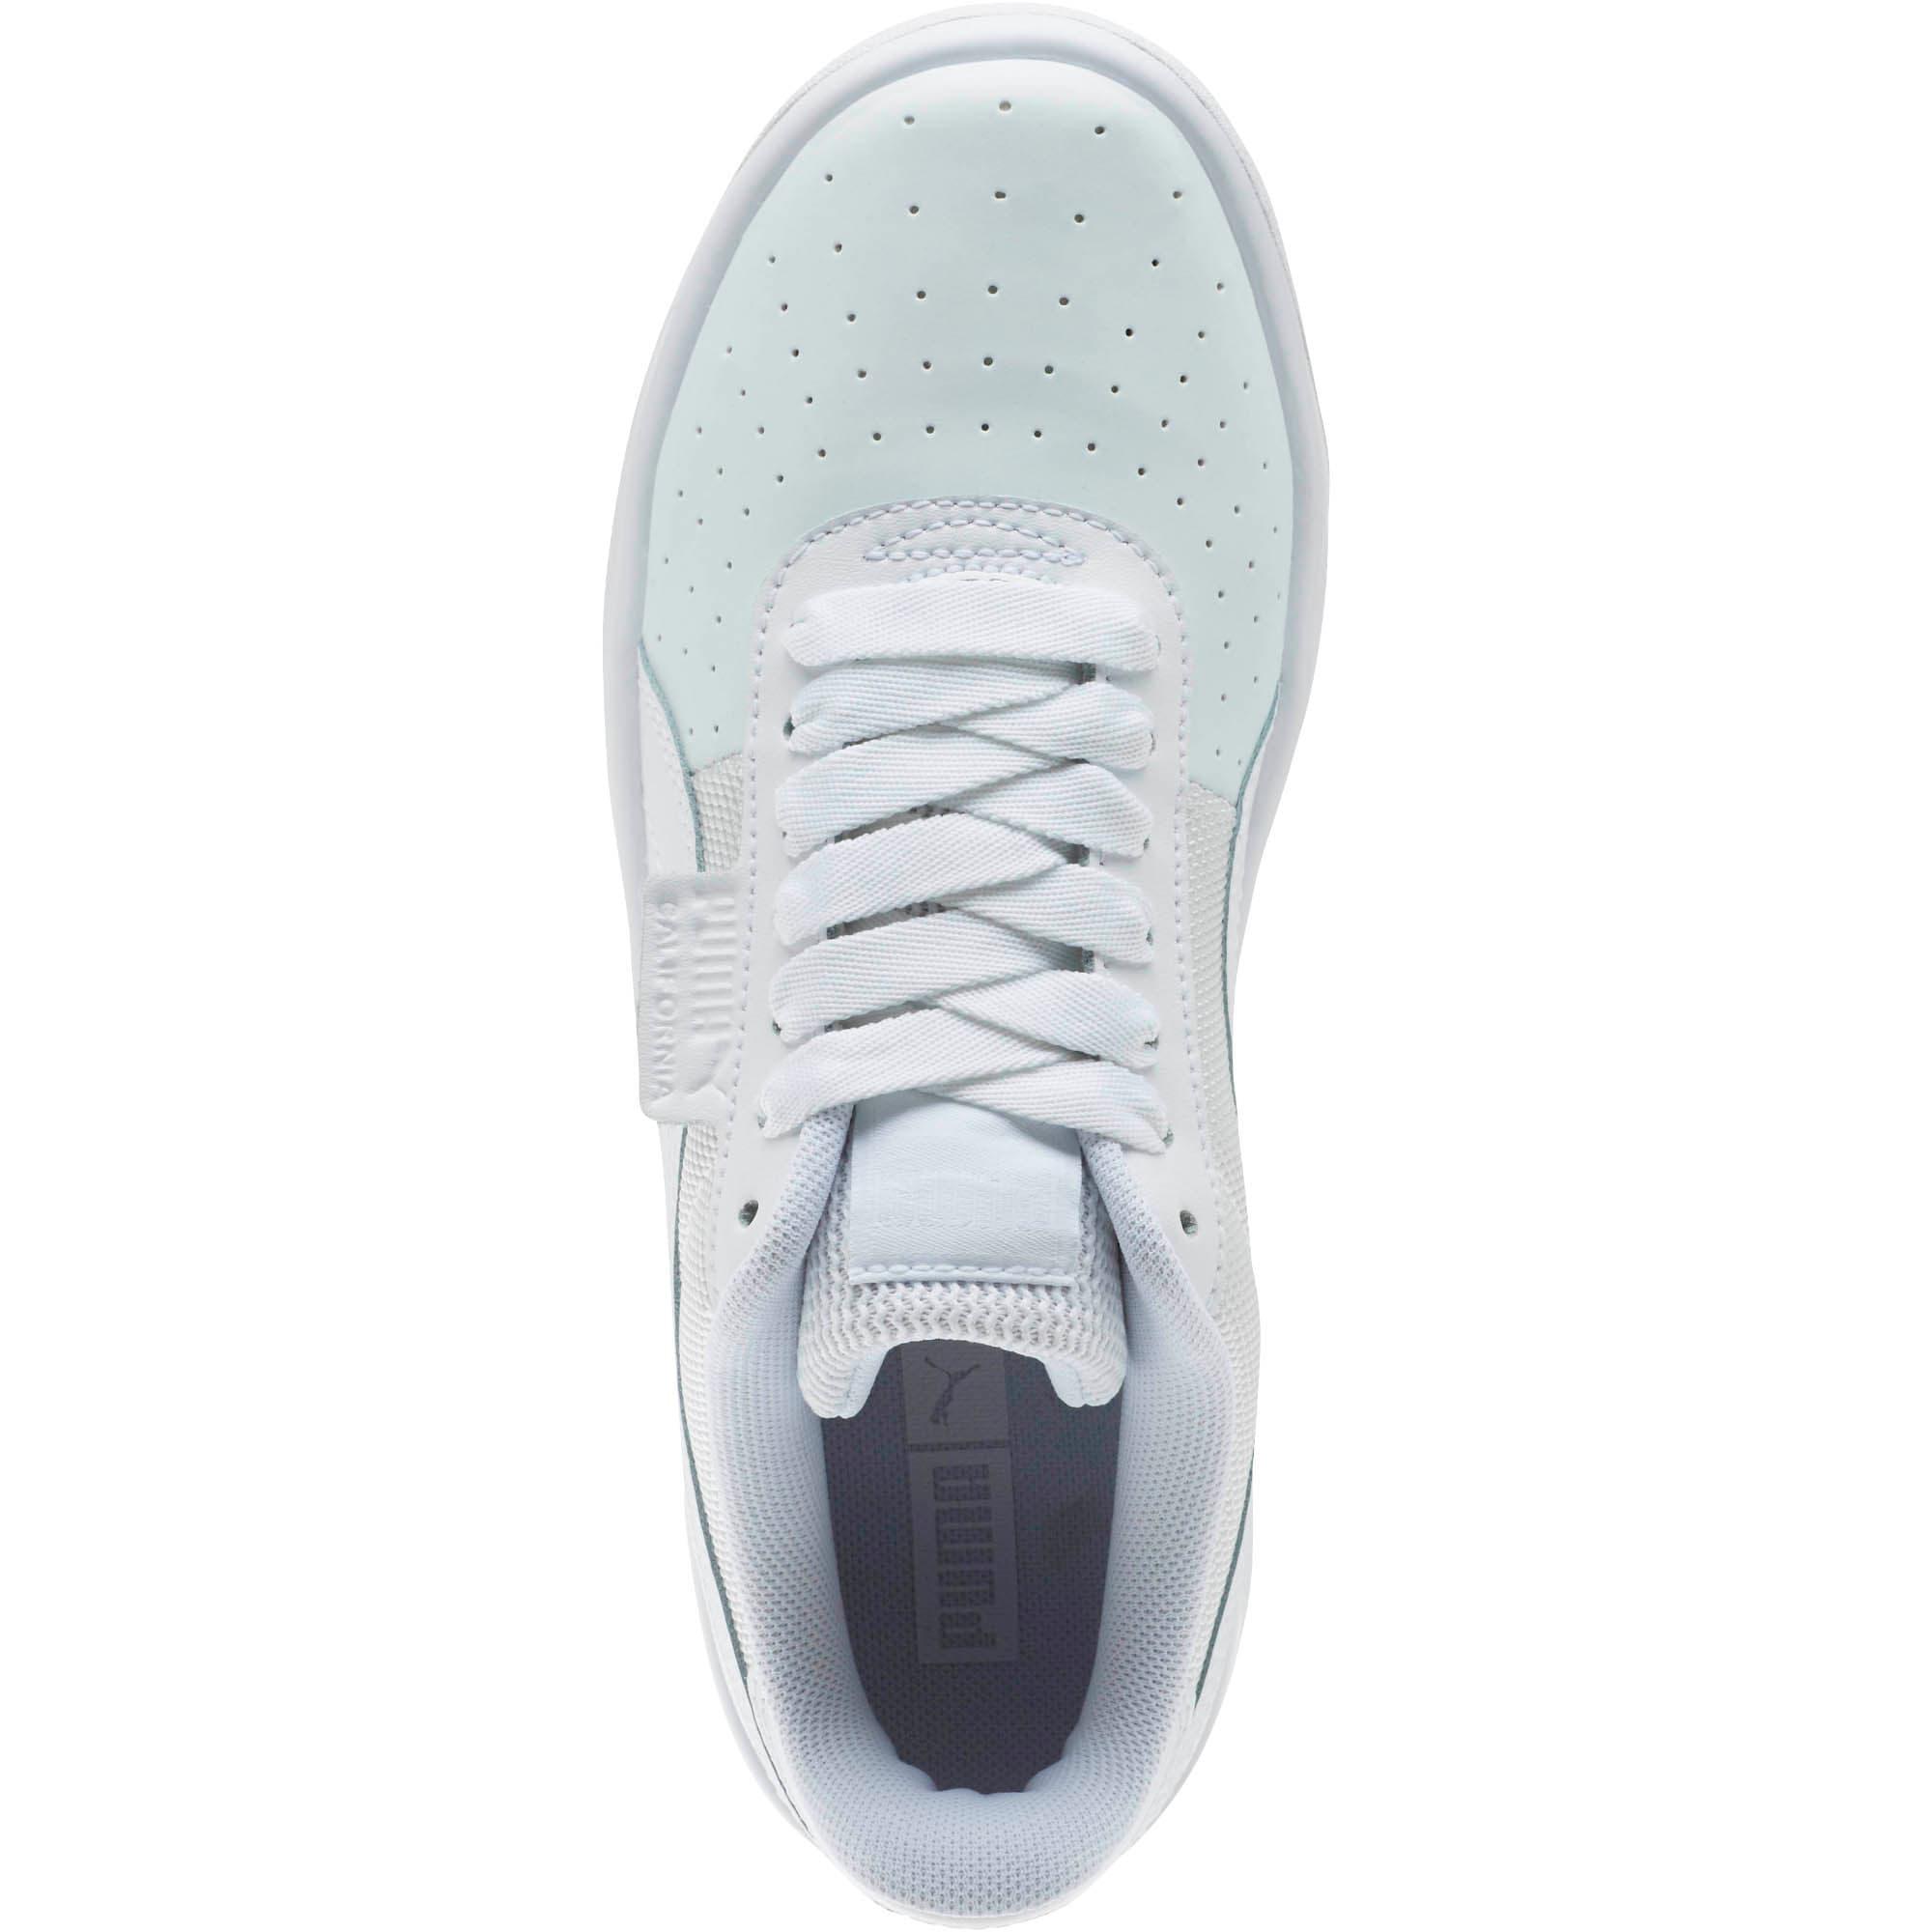 Thumbnail 5 of California Sneakers JR, P White-P White-P White, medium